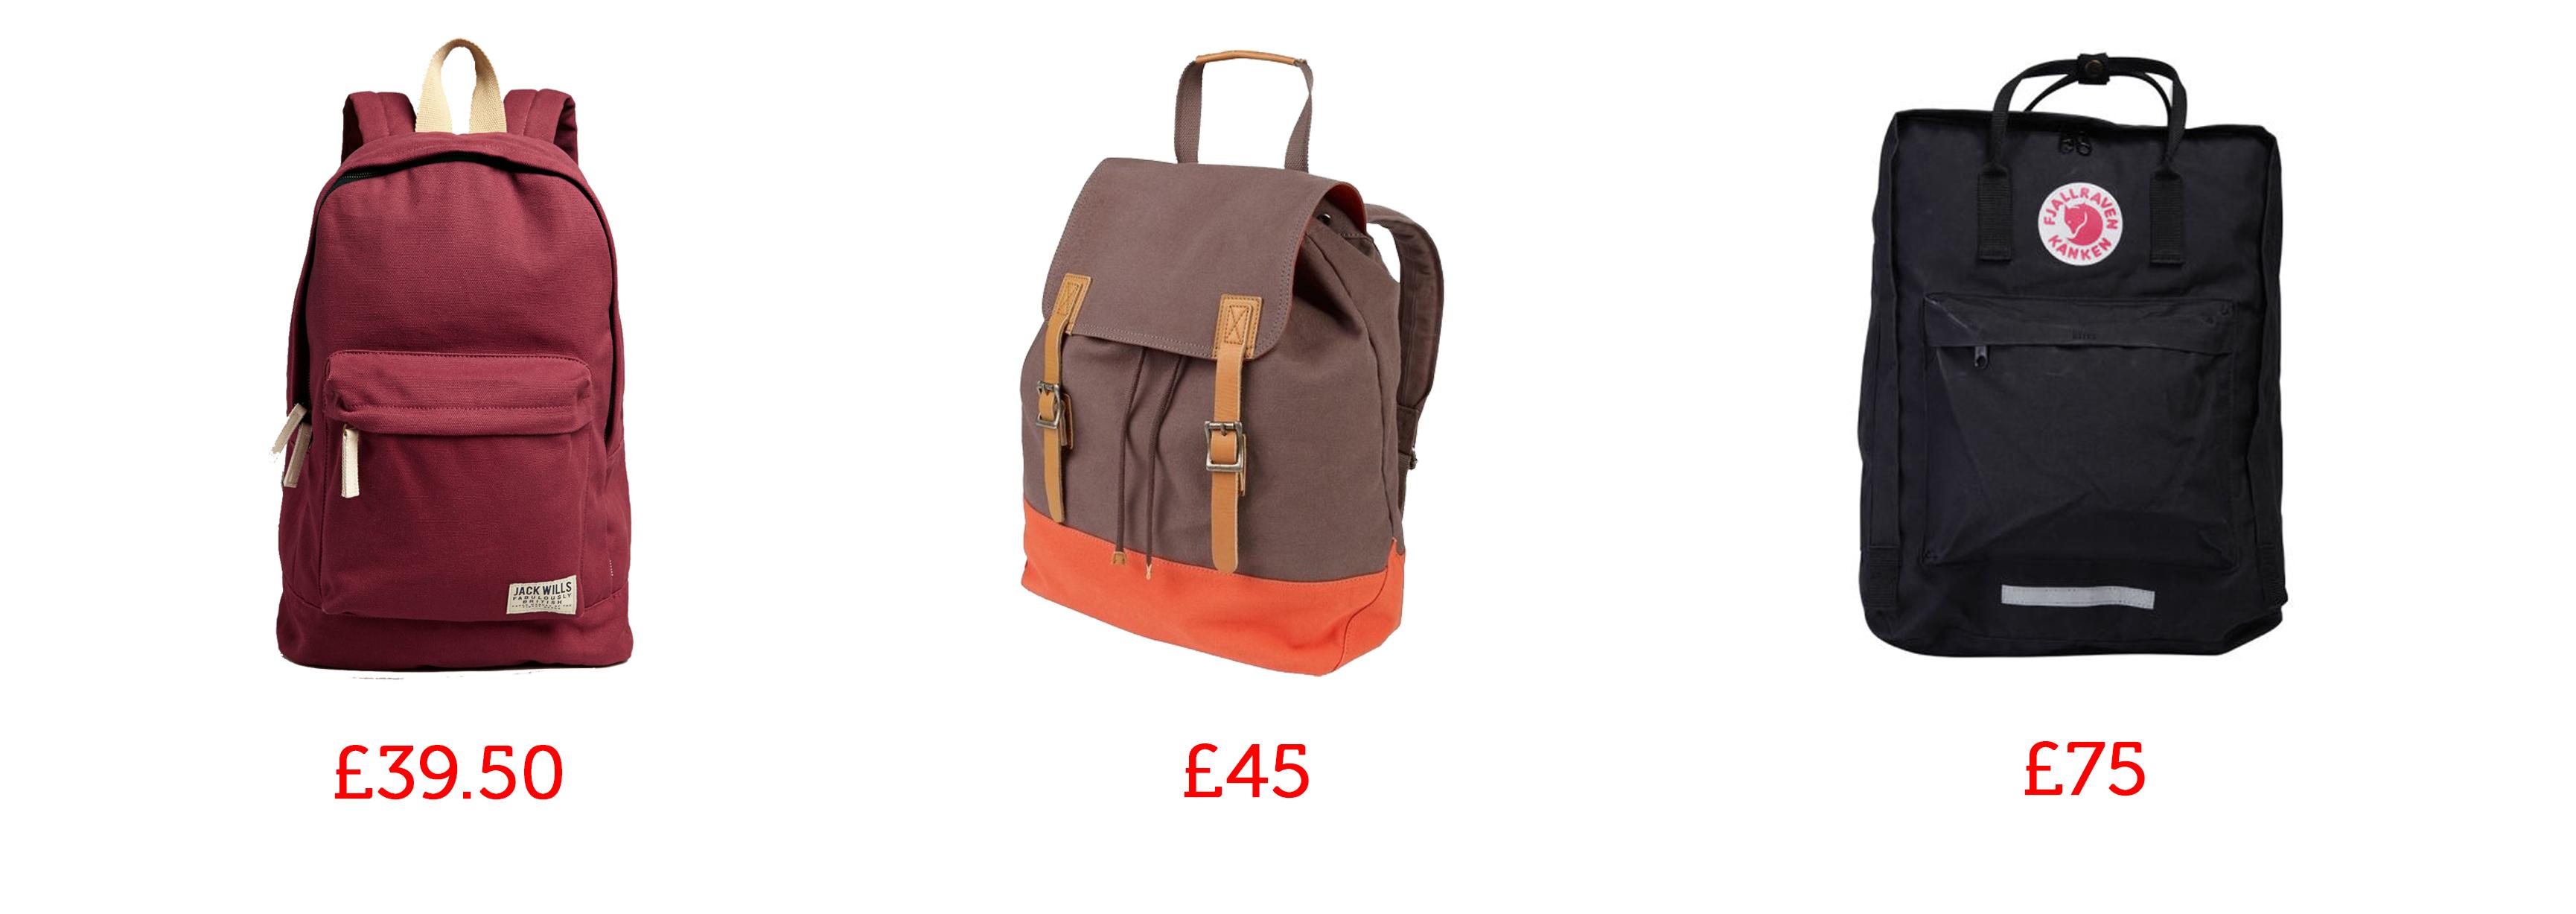 rucksacks backpacks man bags fatface jack wills mybag